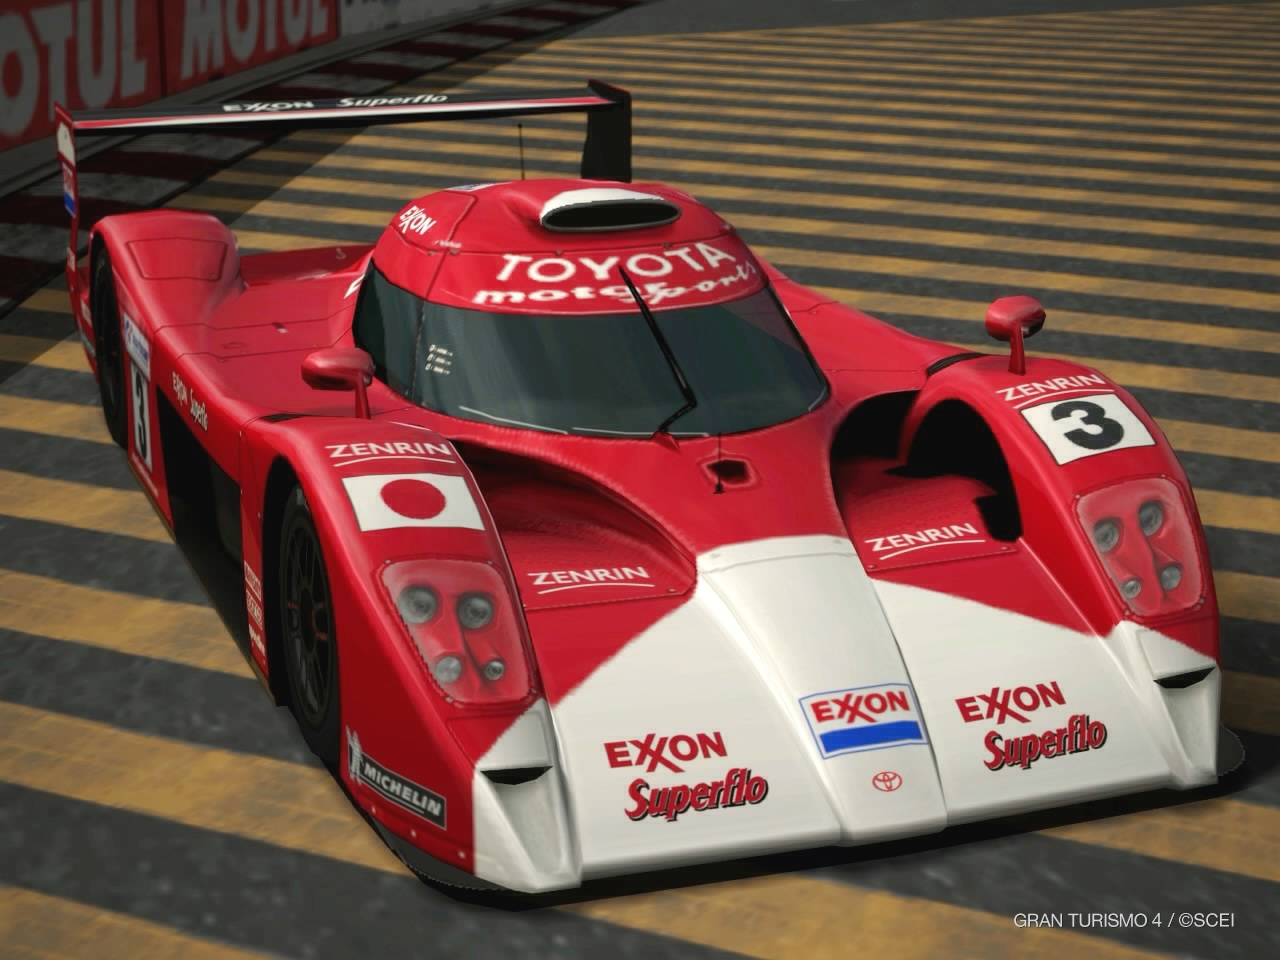 GT4-Toyota GT-ONE Race Car 2 by murumokirby360 on DeviantArt